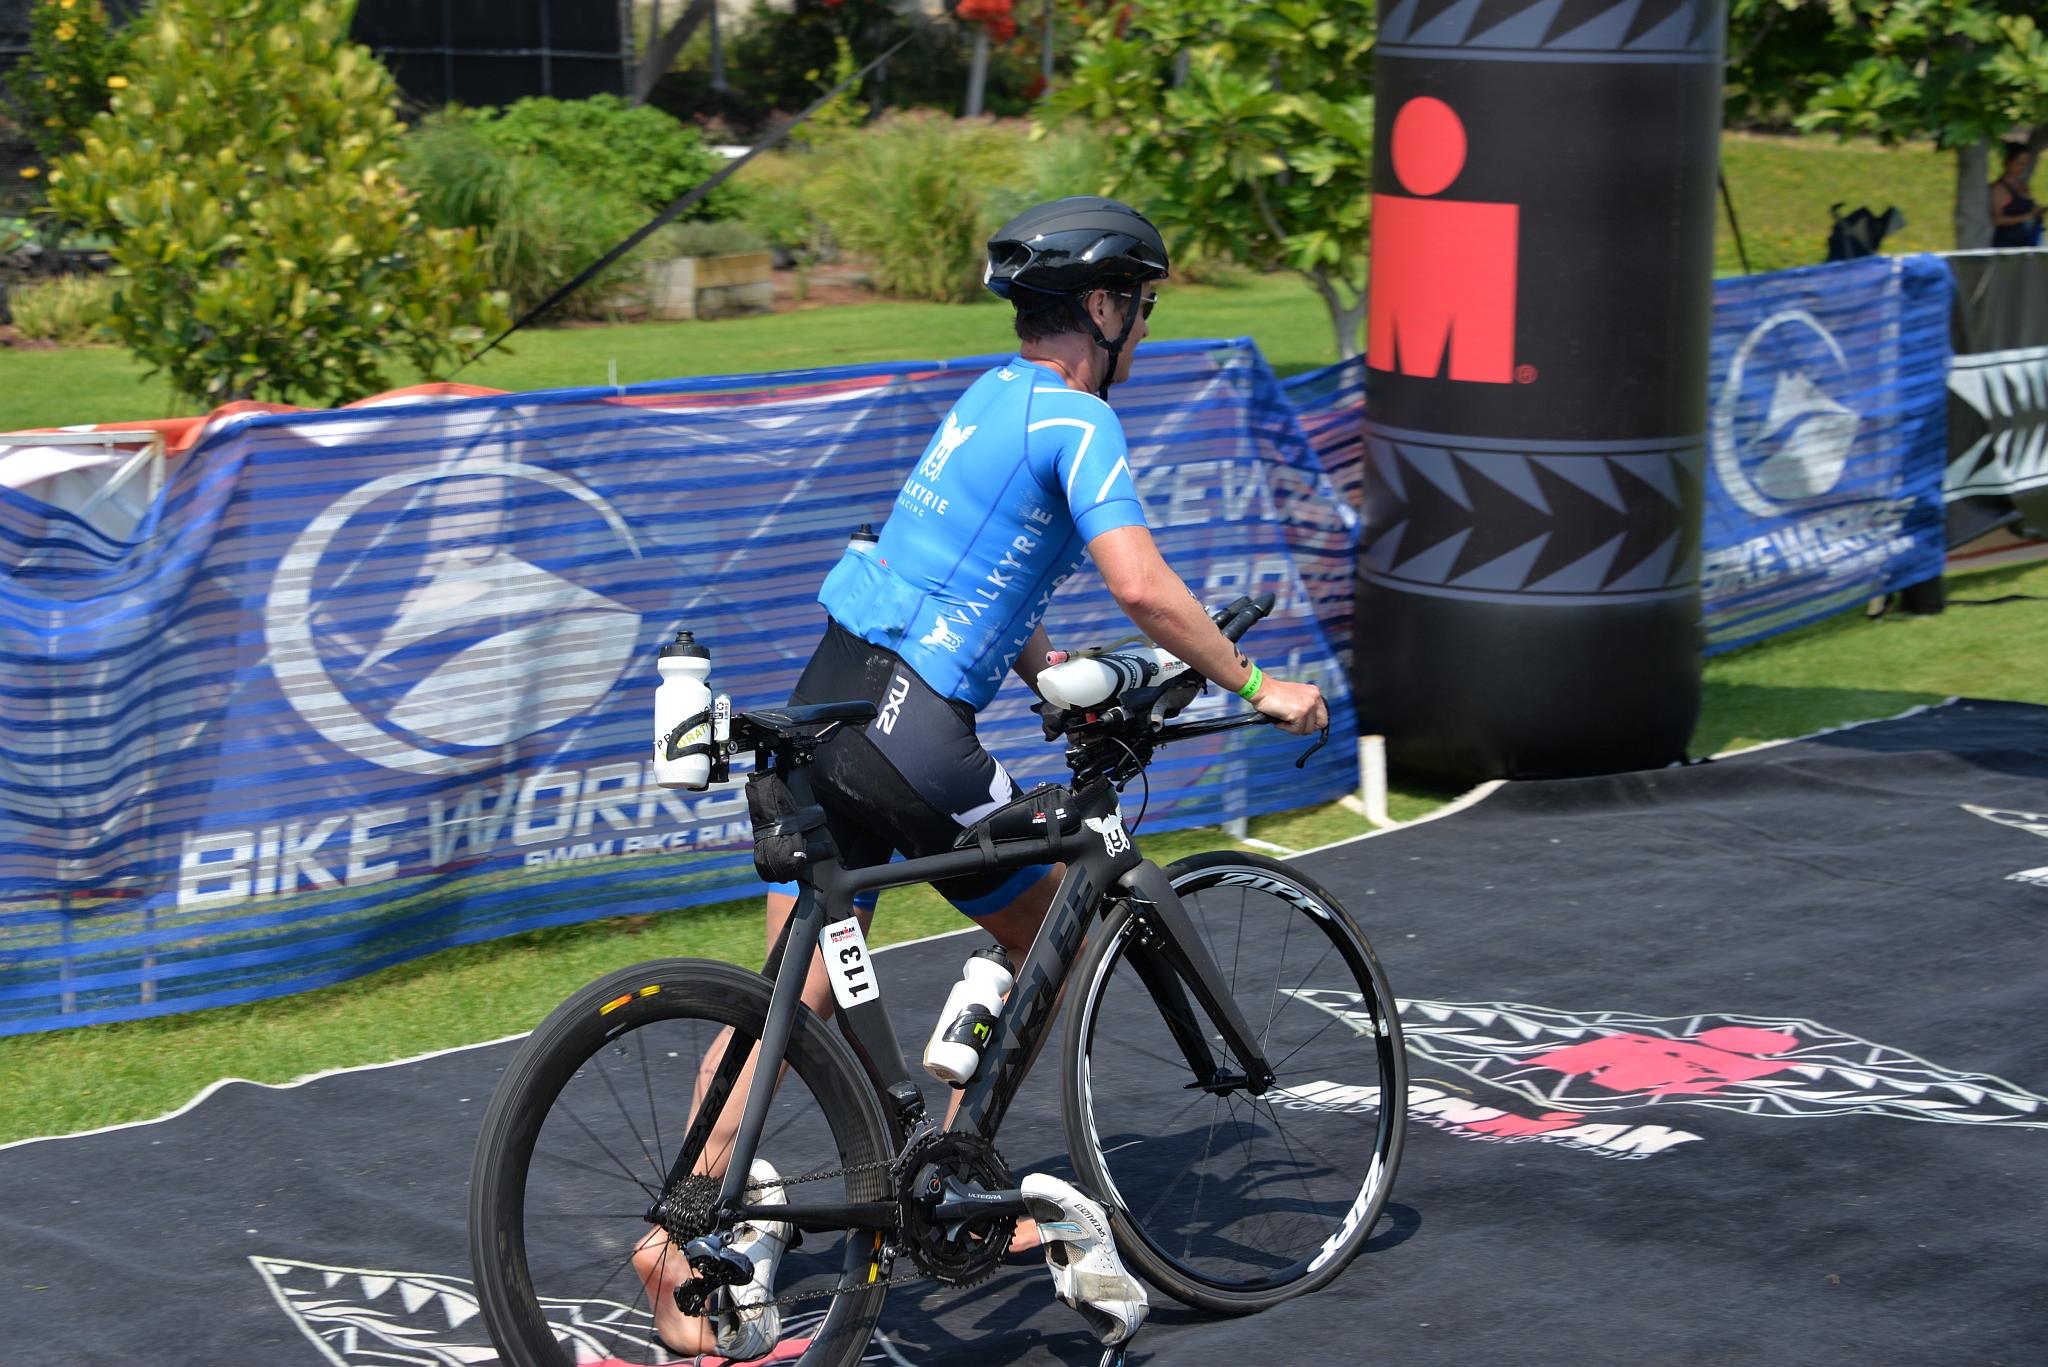 Coach_Terry_Wilson_Gemma_Hollis_Ironman_Hawaii_70.3_Push_Glide_Kick_E3TS_E3_Training_Solutions_3.JPG